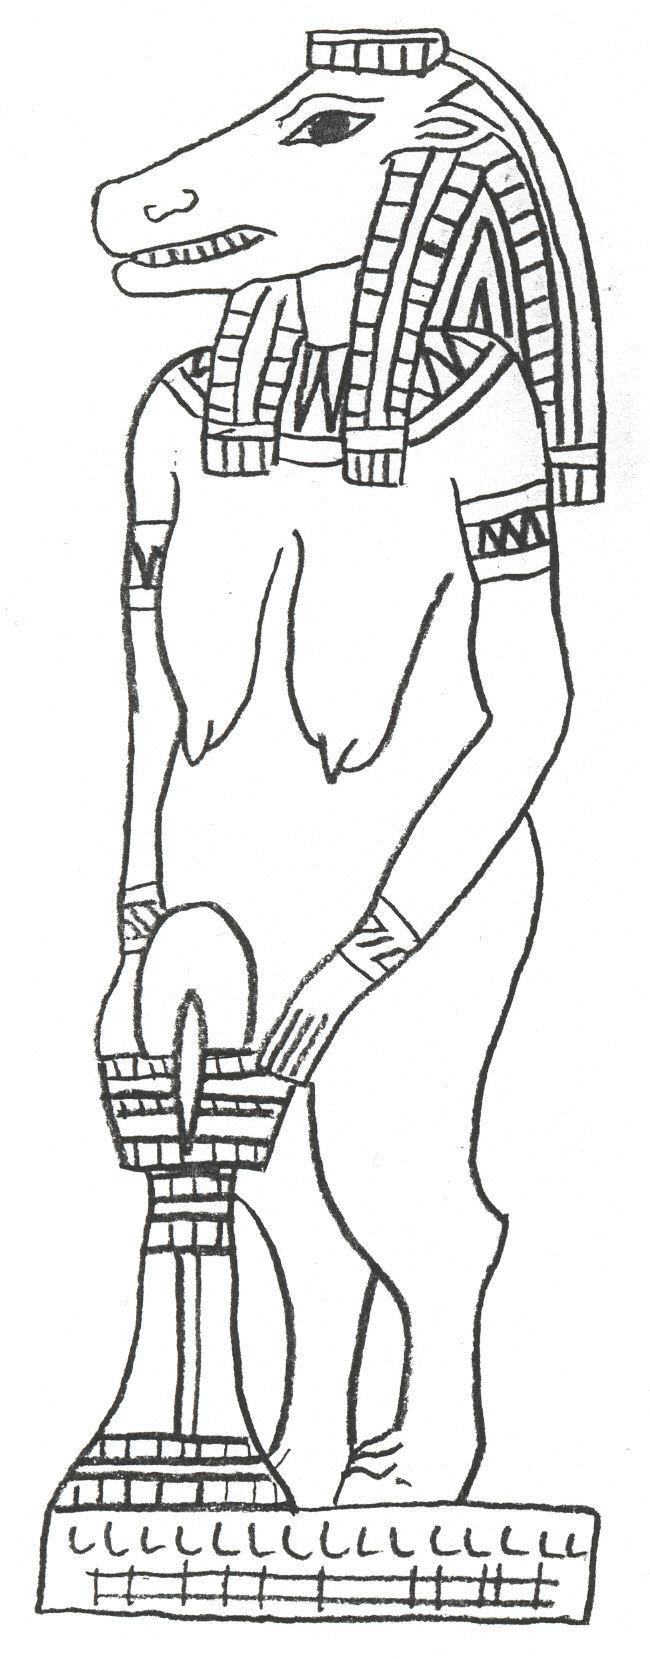 http://www.boiseartmuseum.org/education/egyptian/Taweret